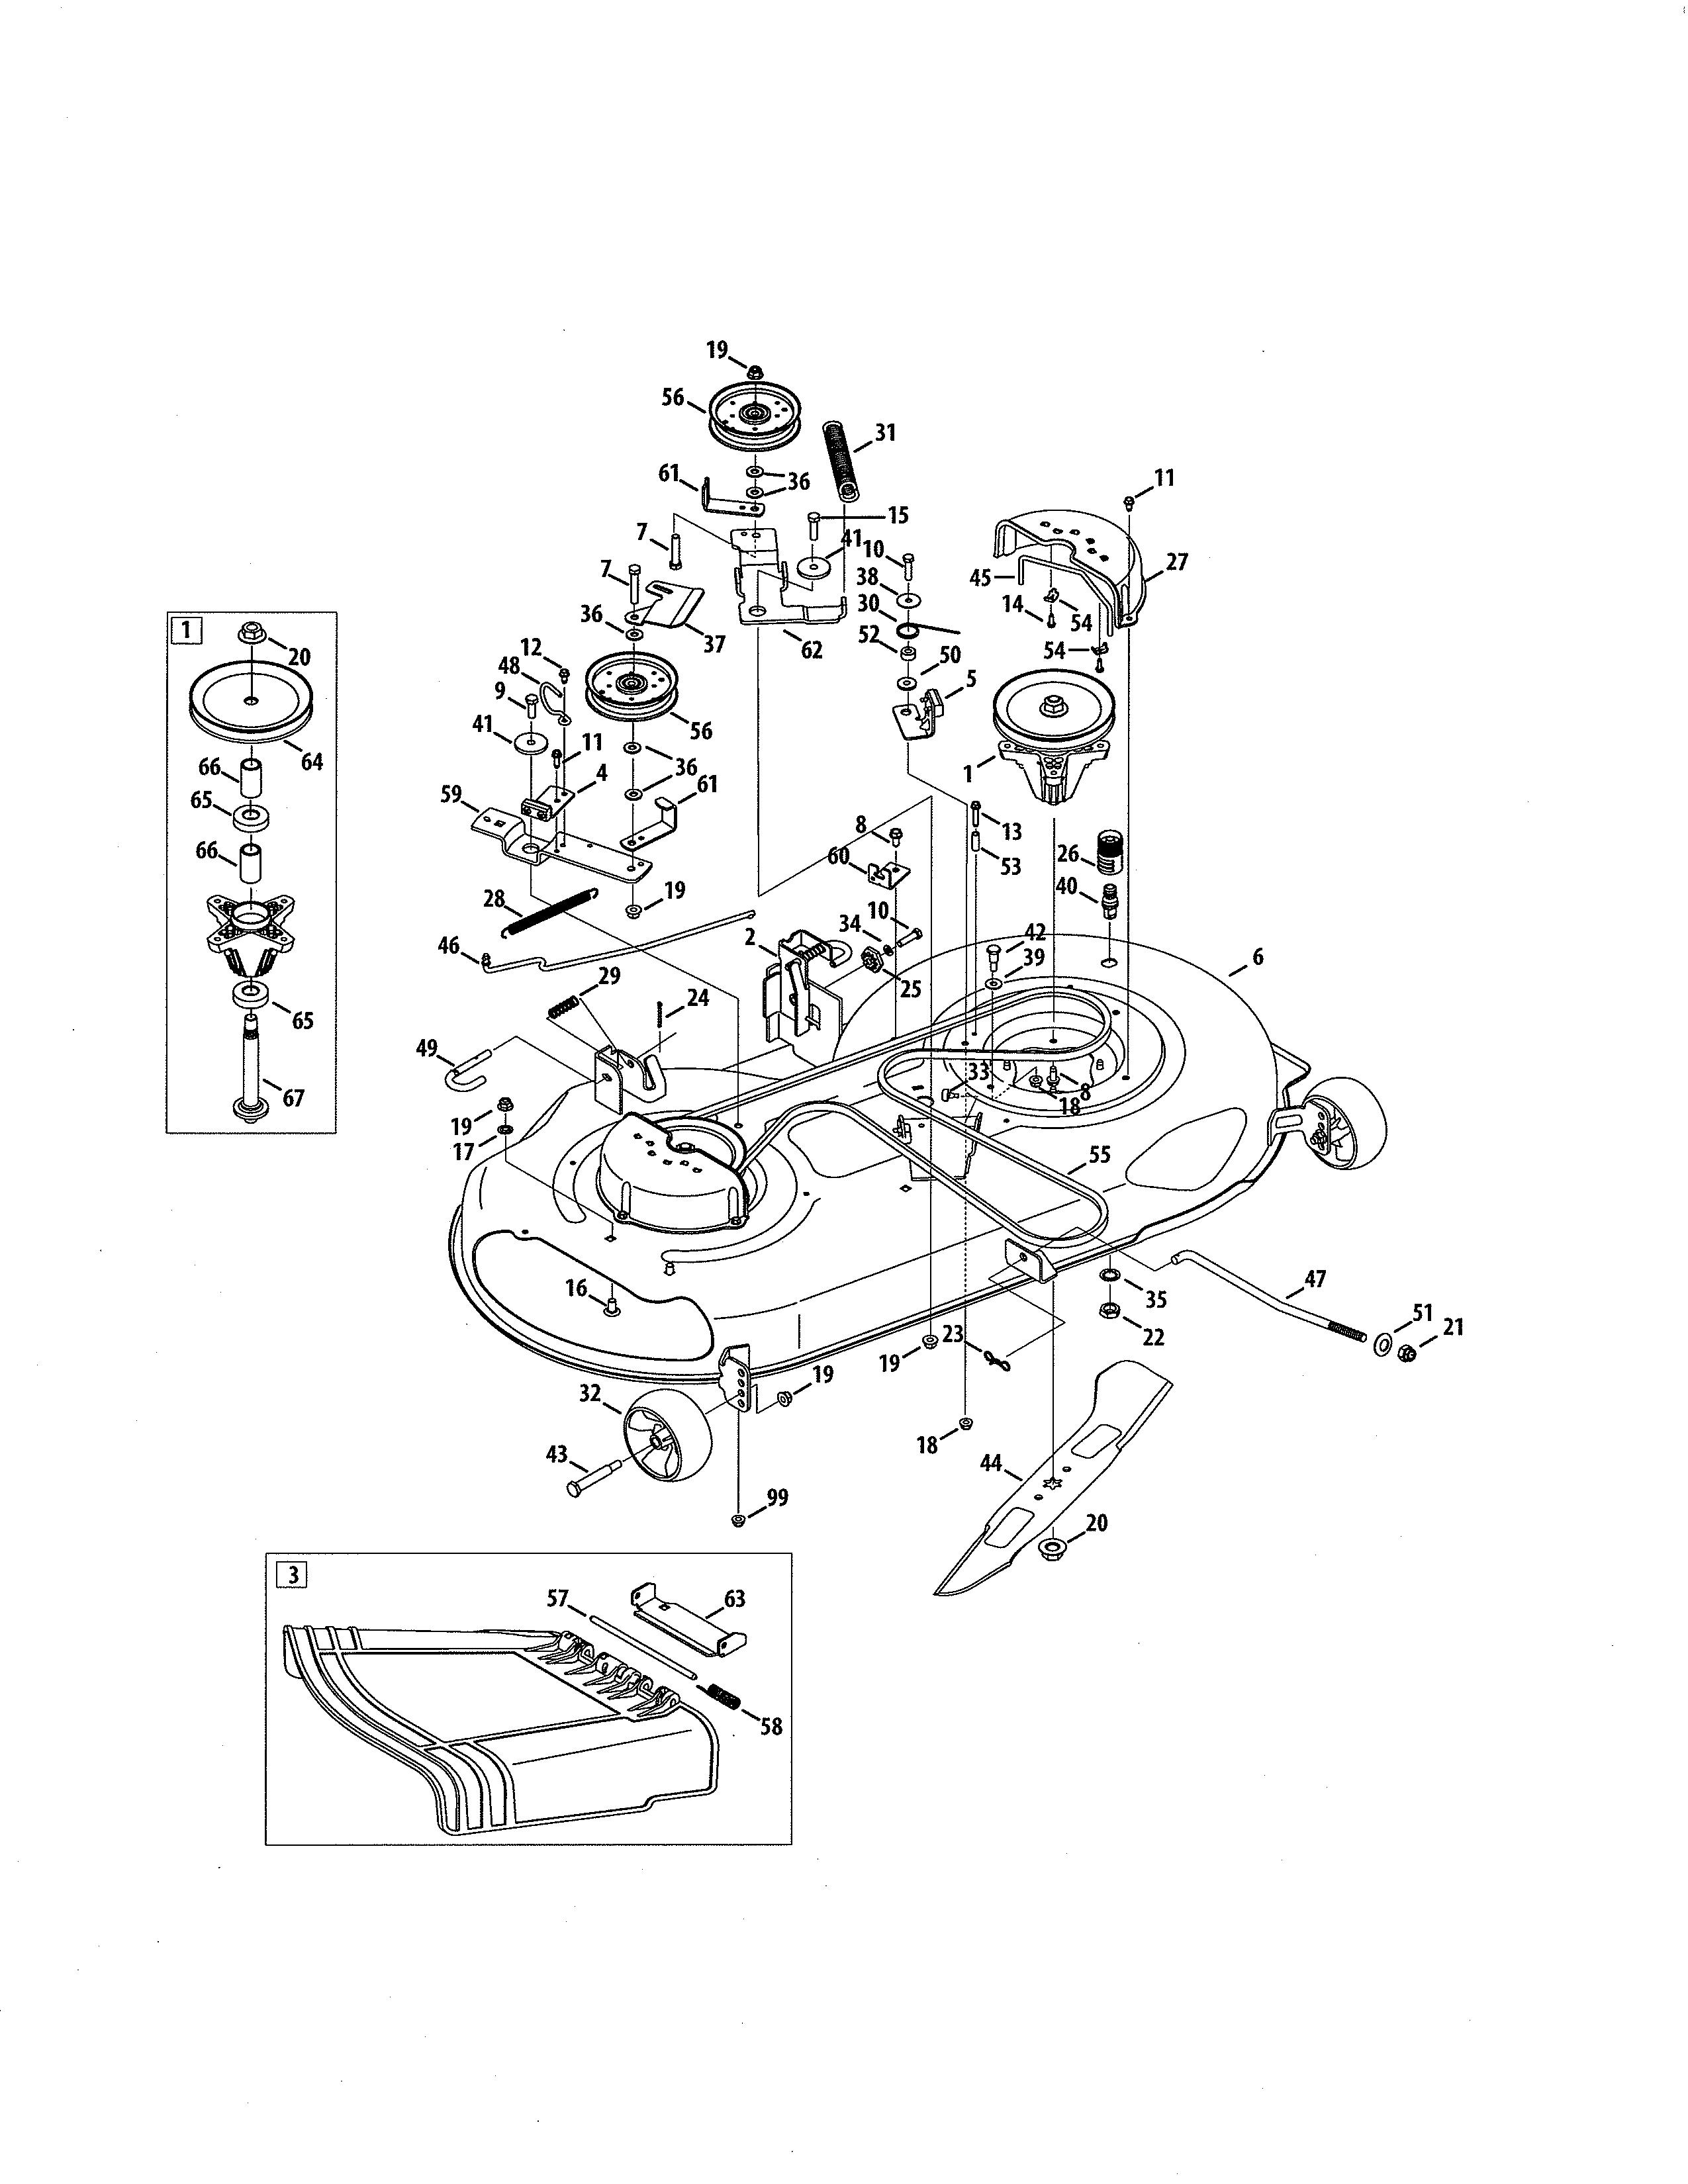 Craftsman lt2000 parts diagram